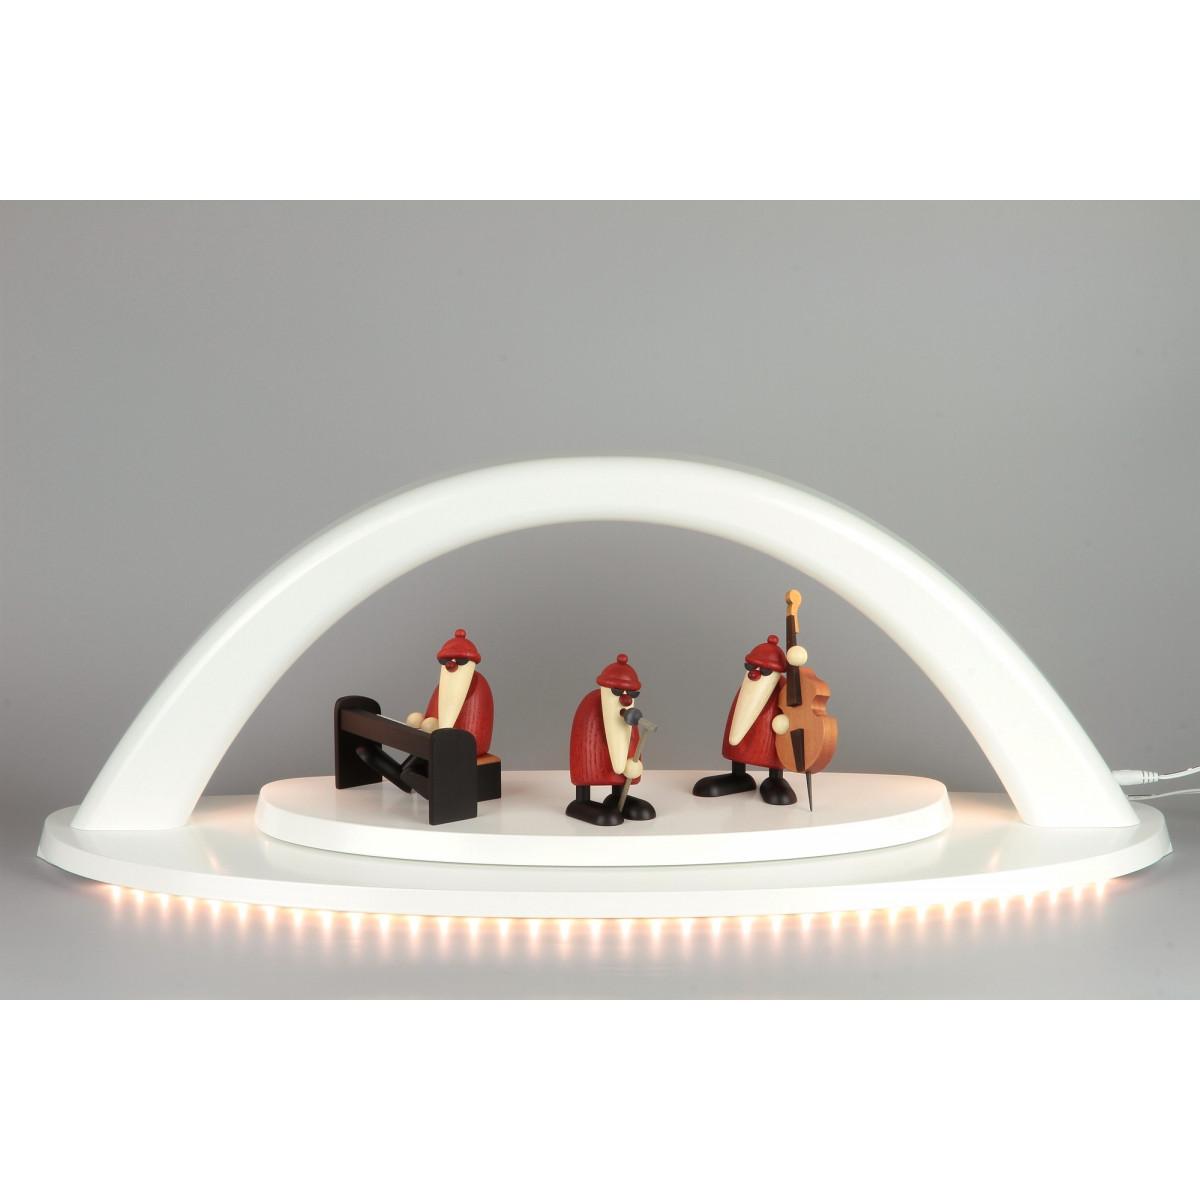 led schwibbogen wei mit bj rn k hler weihnachtsmannband gro erzgebirgskunst drechsel. Black Bedroom Furniture Sets. Home Design Ideas